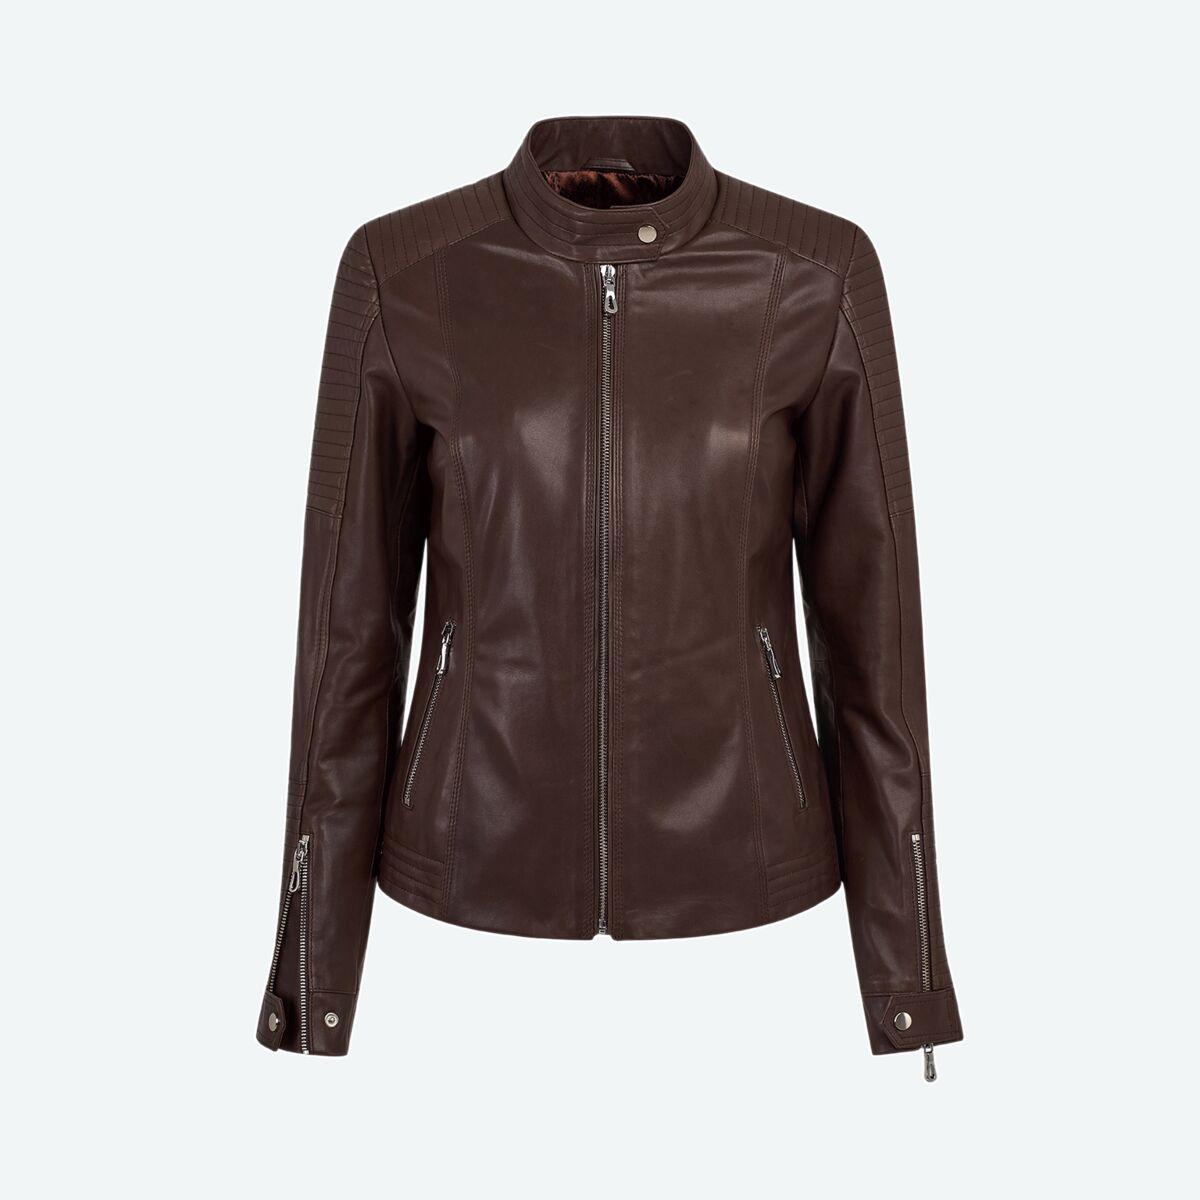 Women's Quilted Leather Jacket - Dark Brown